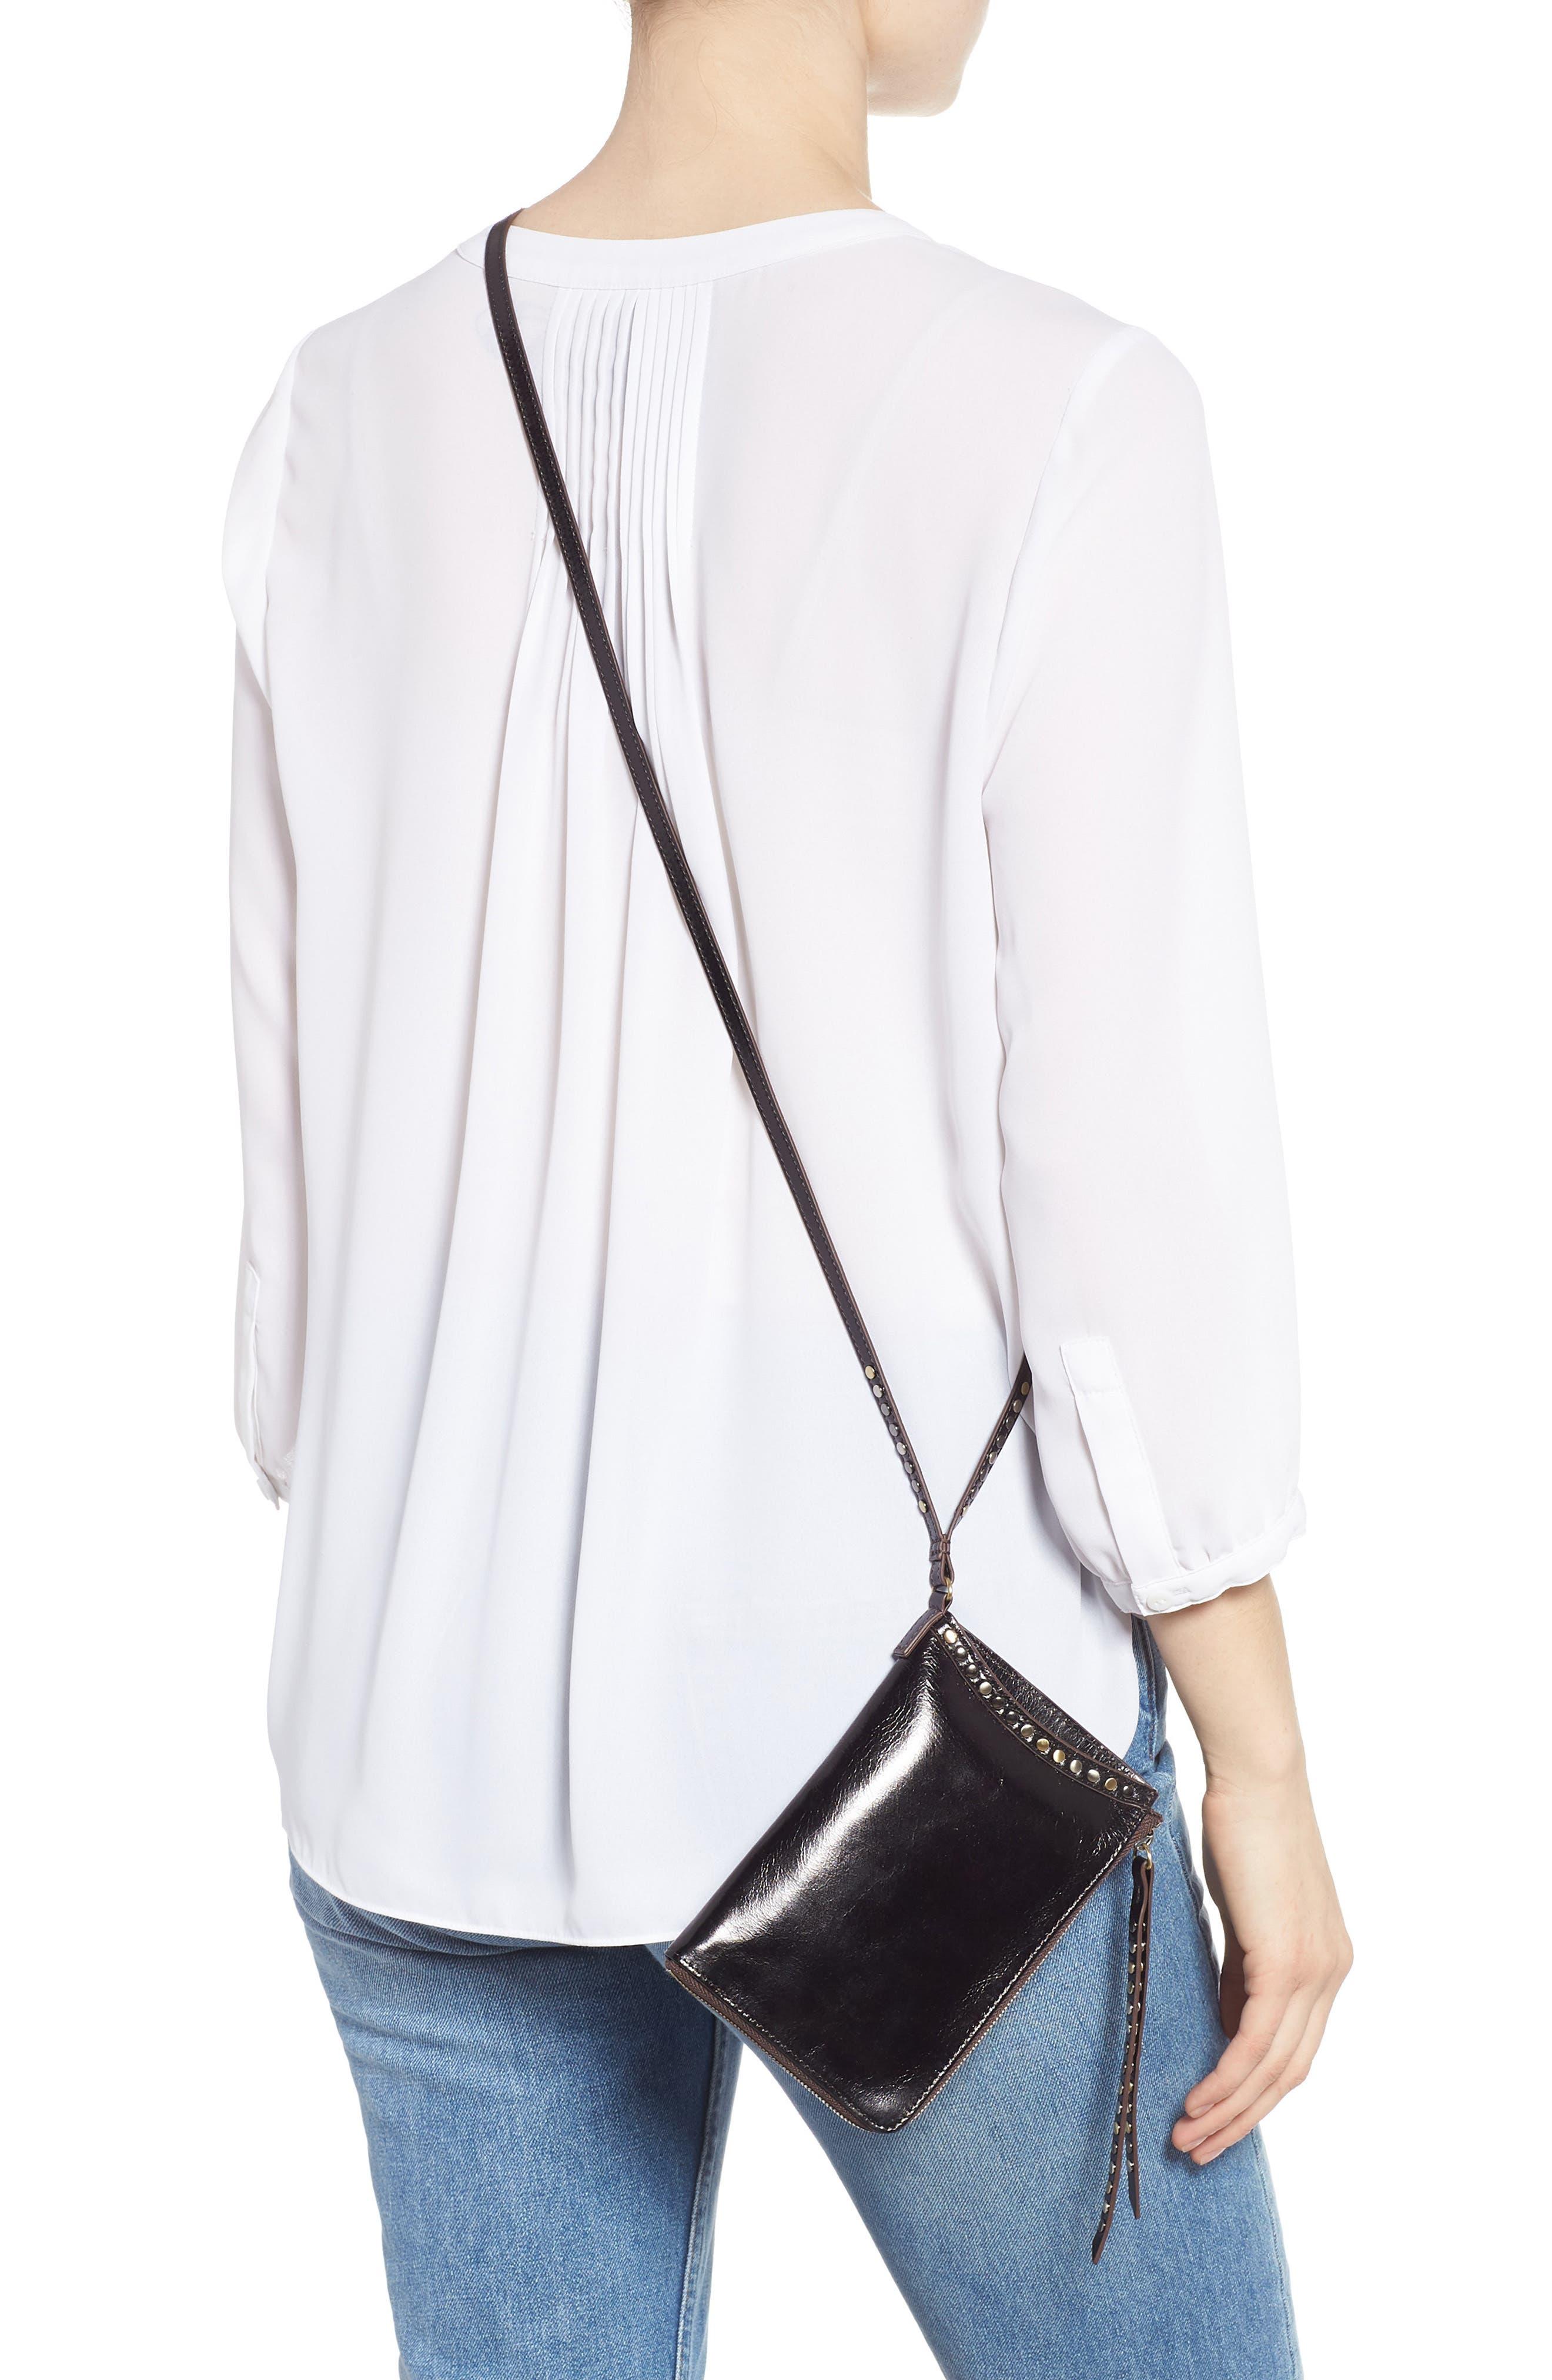 HOBO,                             Moxie Leather Crossbody Bag,                             Alternate thumbnail 2, color,                             BLACK